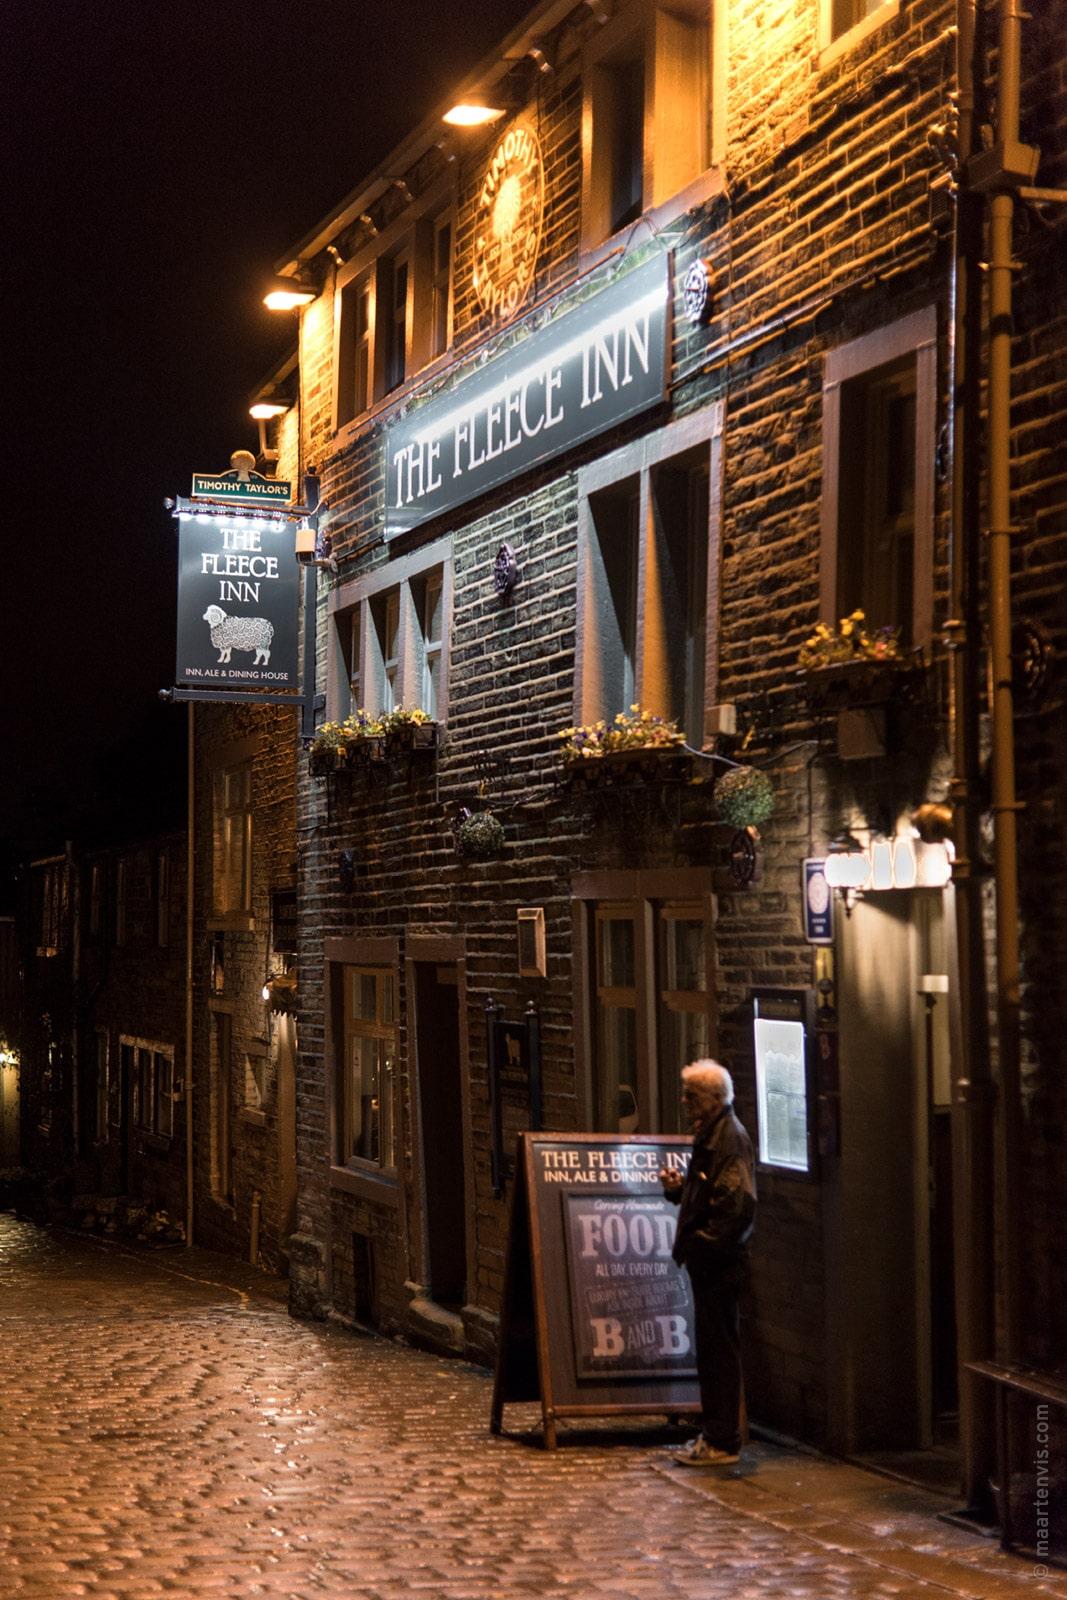 20160324 8203 - Sleeping above the Fleece Inn